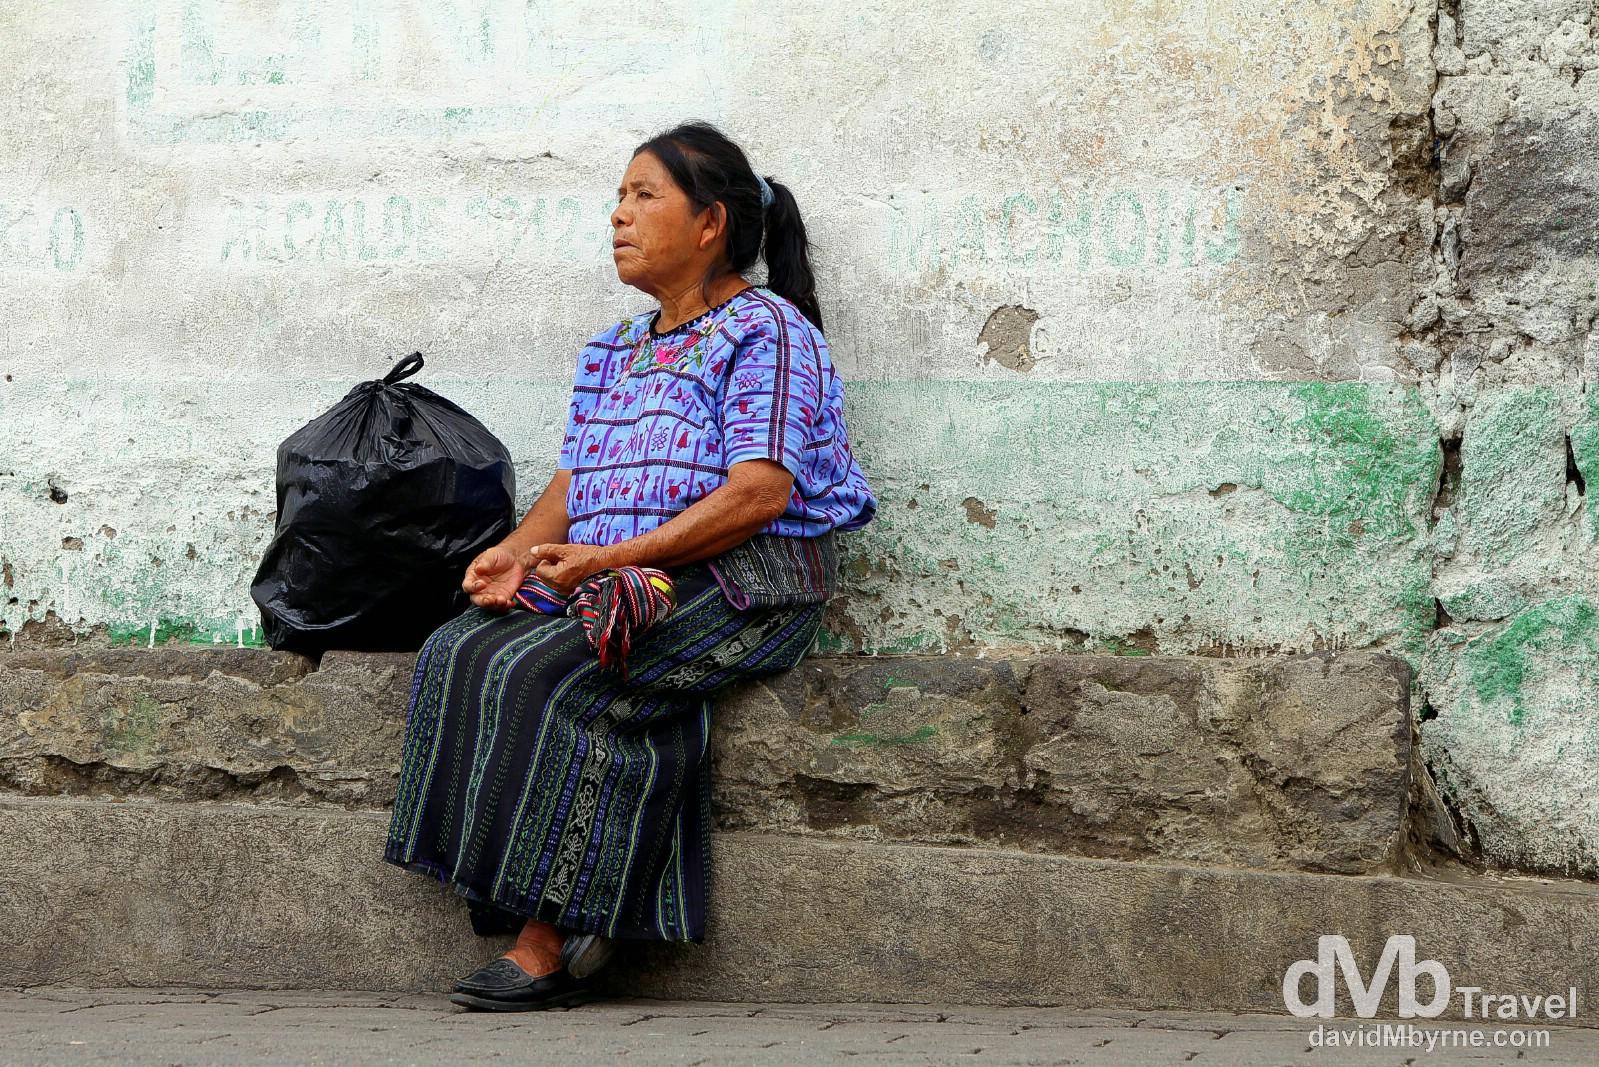 Santiago Atitlan, Guatemala. May 24th 2013.